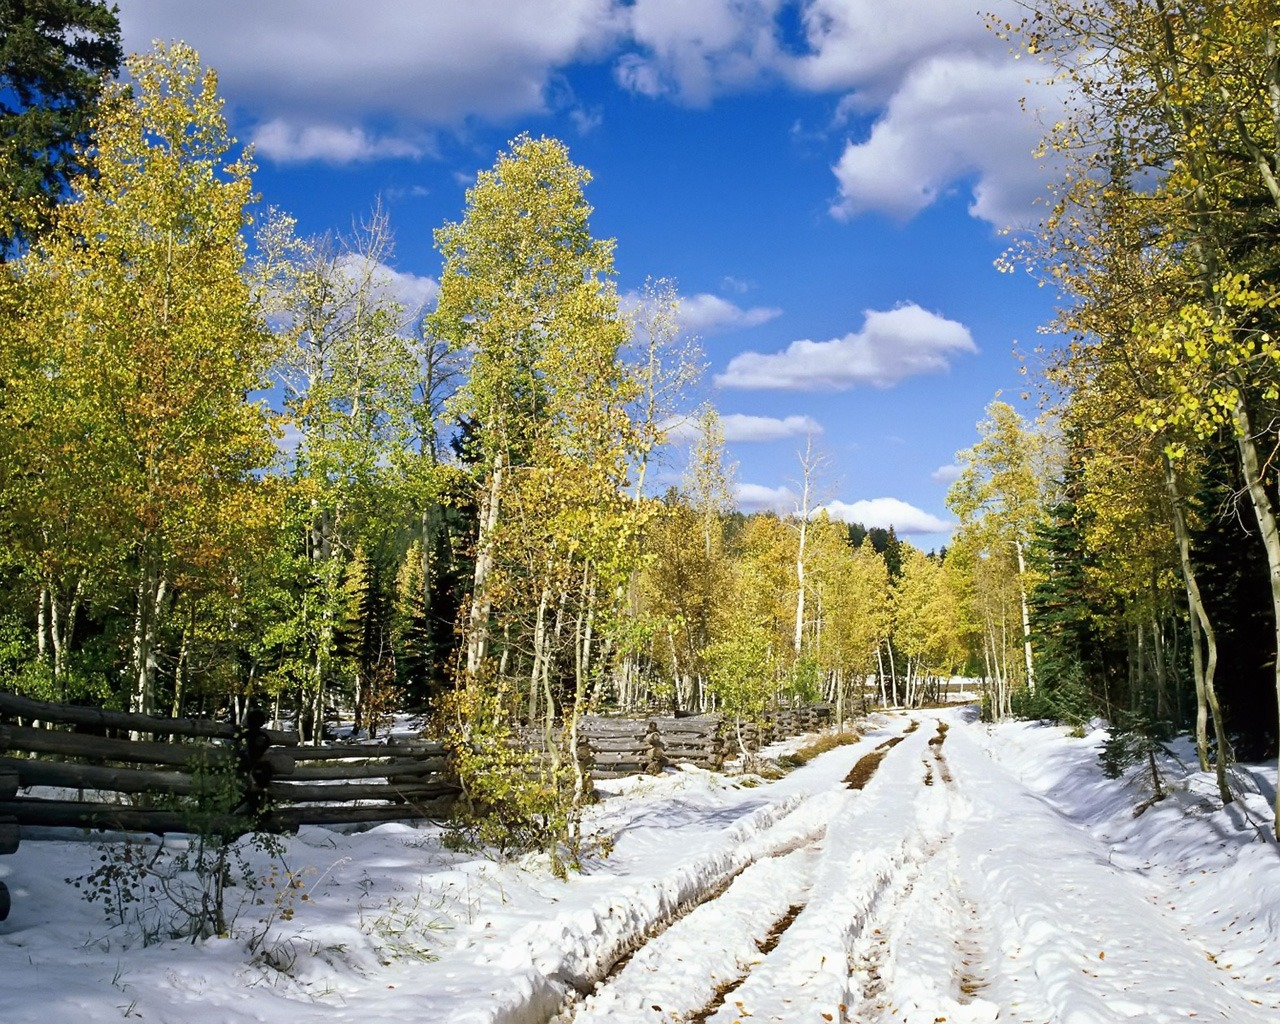 Utah in Early Winter Wallpaper Winter Nature Wallpapers in jpg format 1280x1024